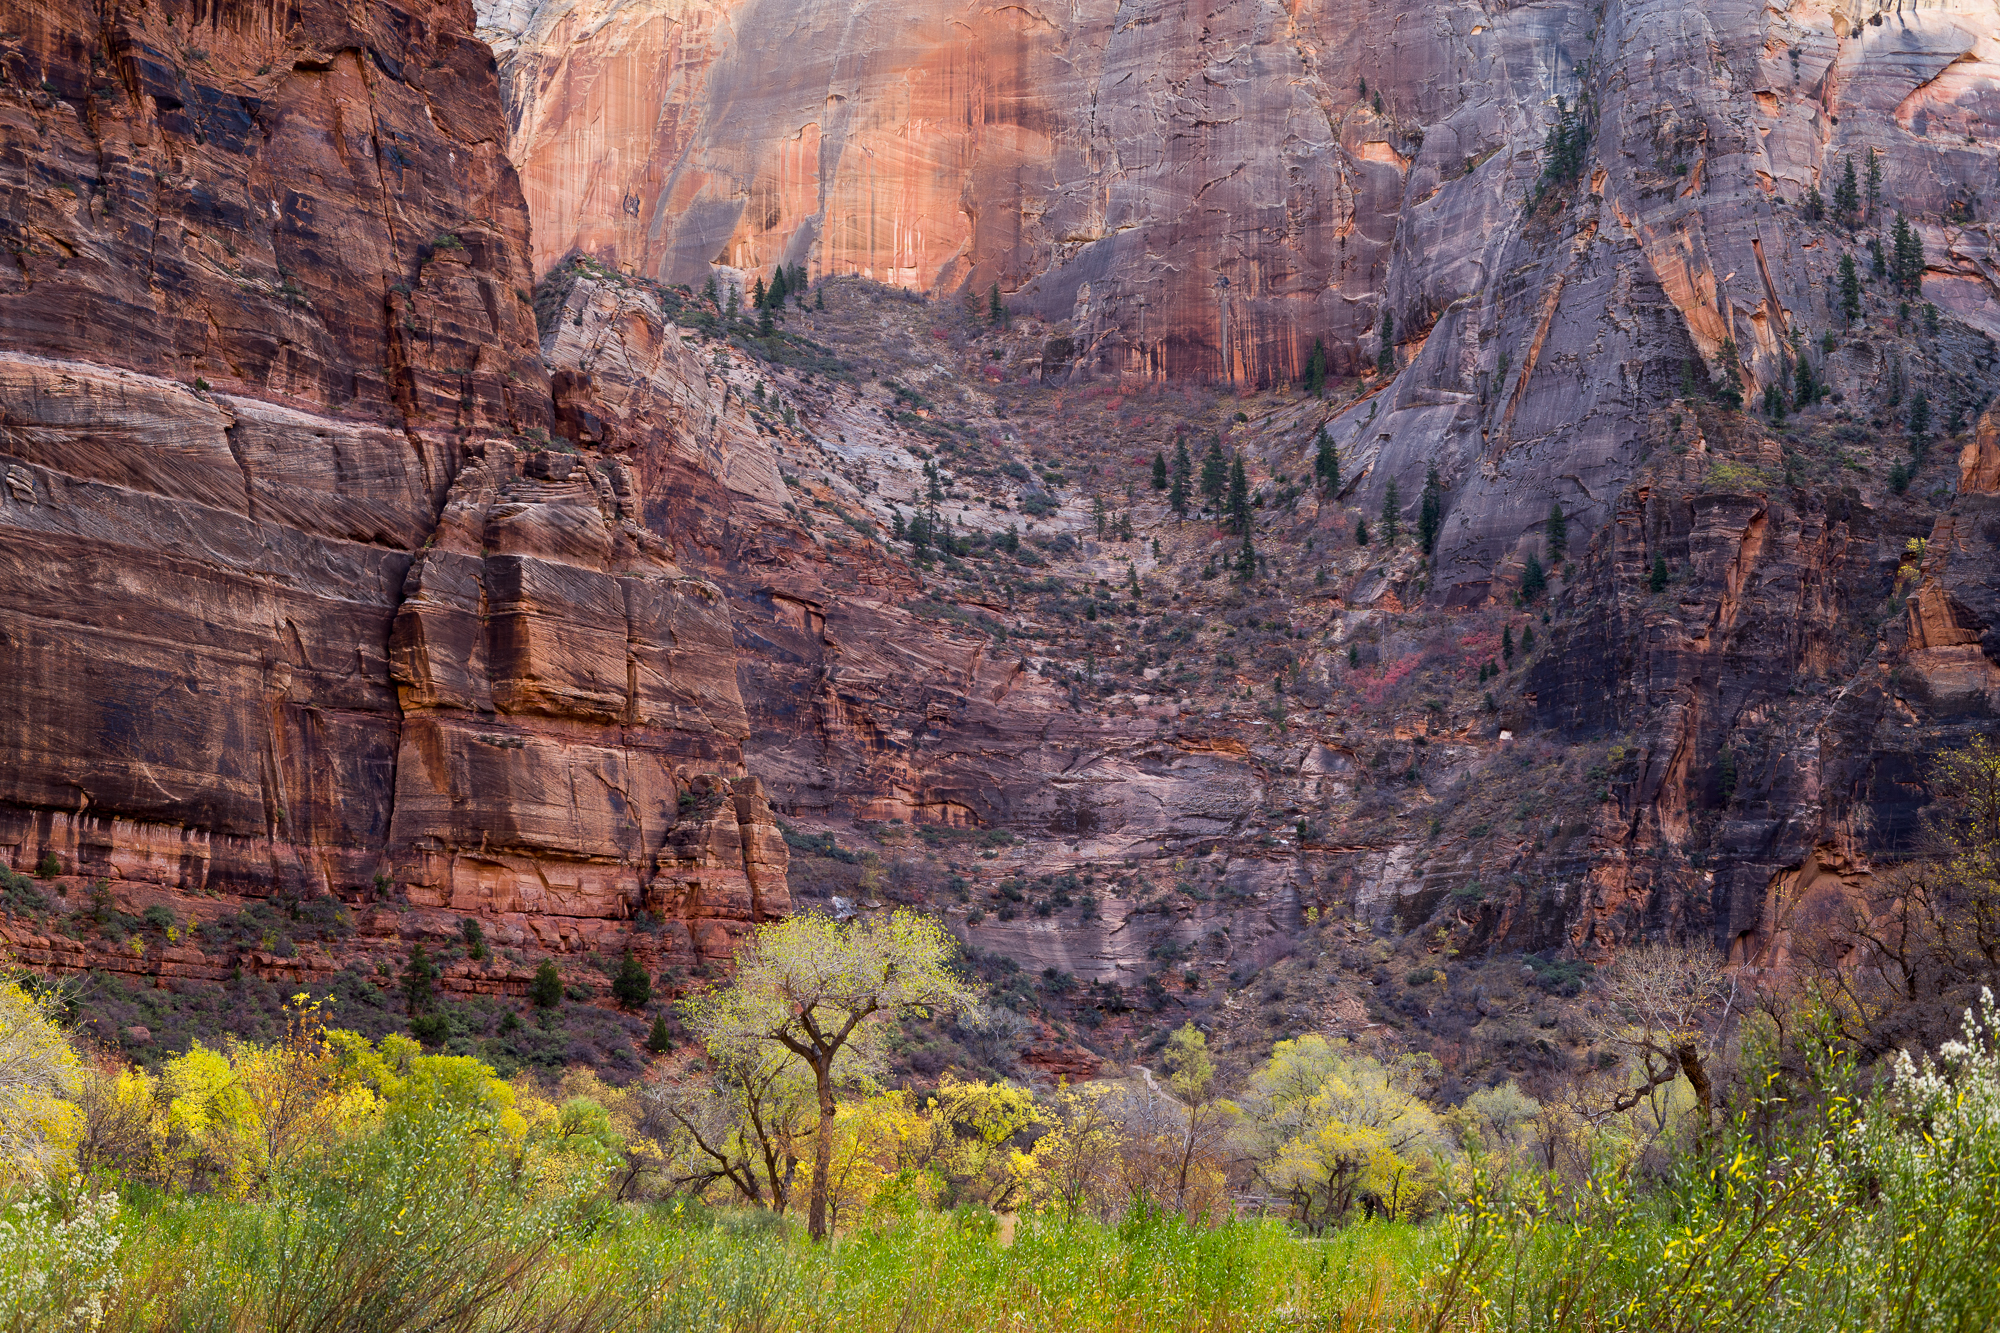 Zion Canyon - Image 1